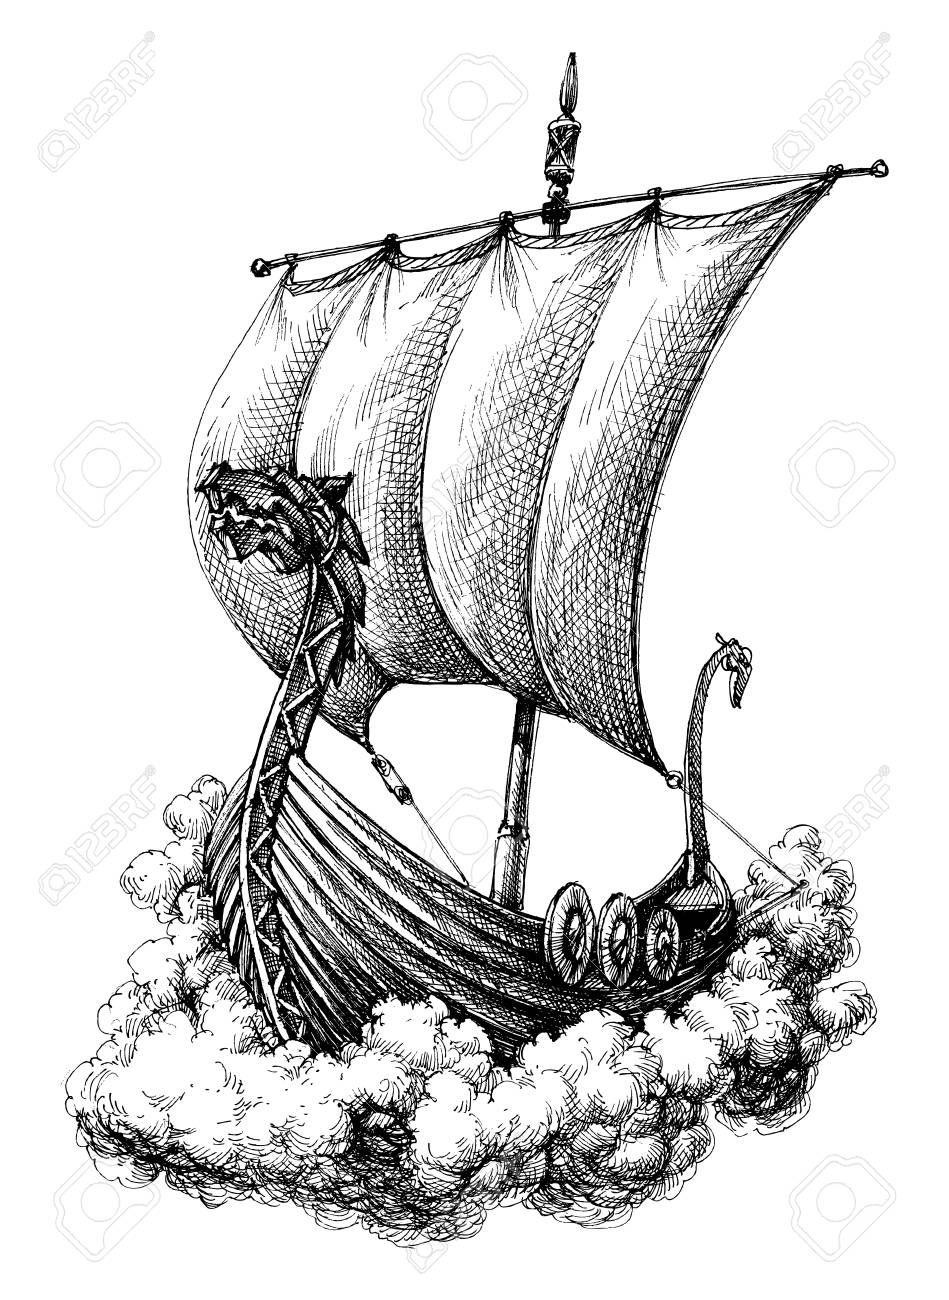 Found On Bing From Getdrawings Com Viking Drawings Boat Drawing Viking Ship Tattoo